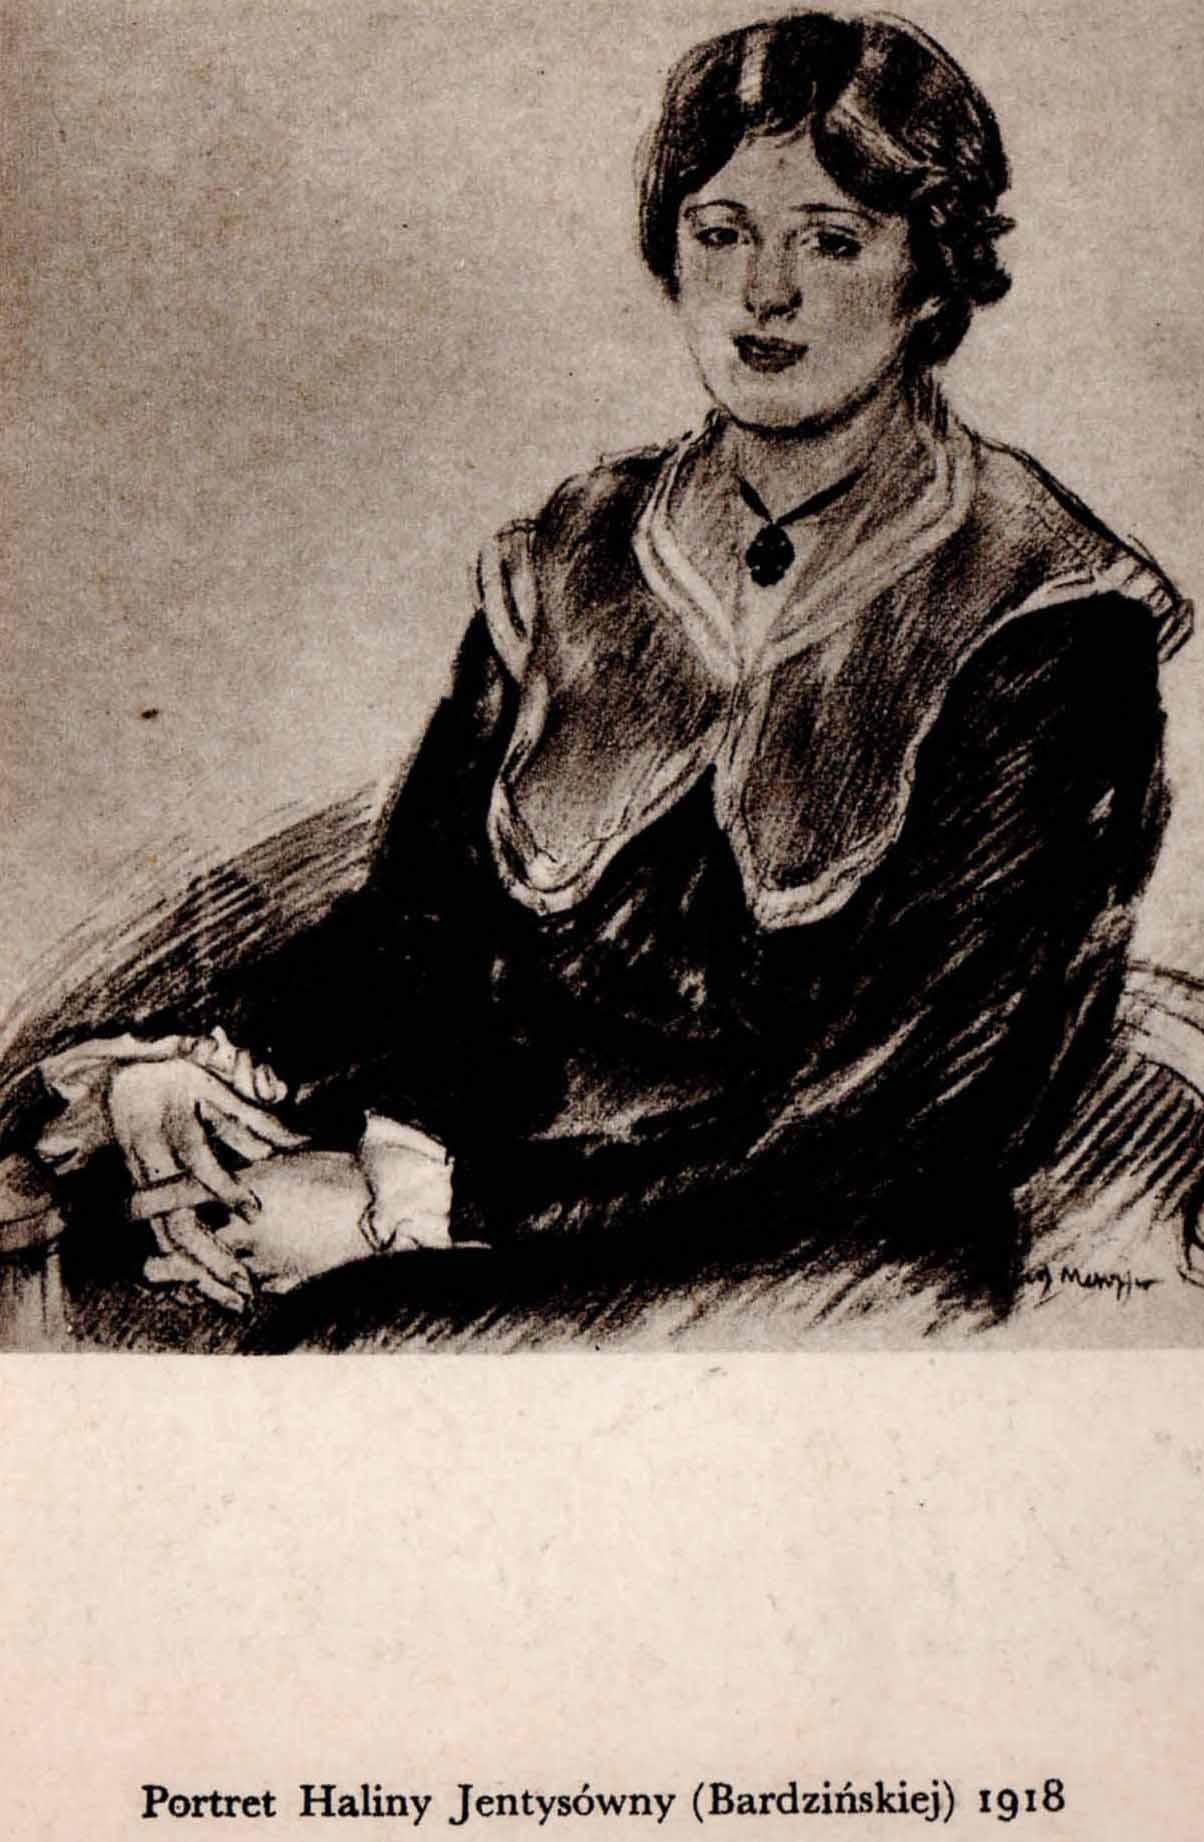 Józef Mehoffer Portret Haliny Jentysówny (Bardzińskiej) 1918